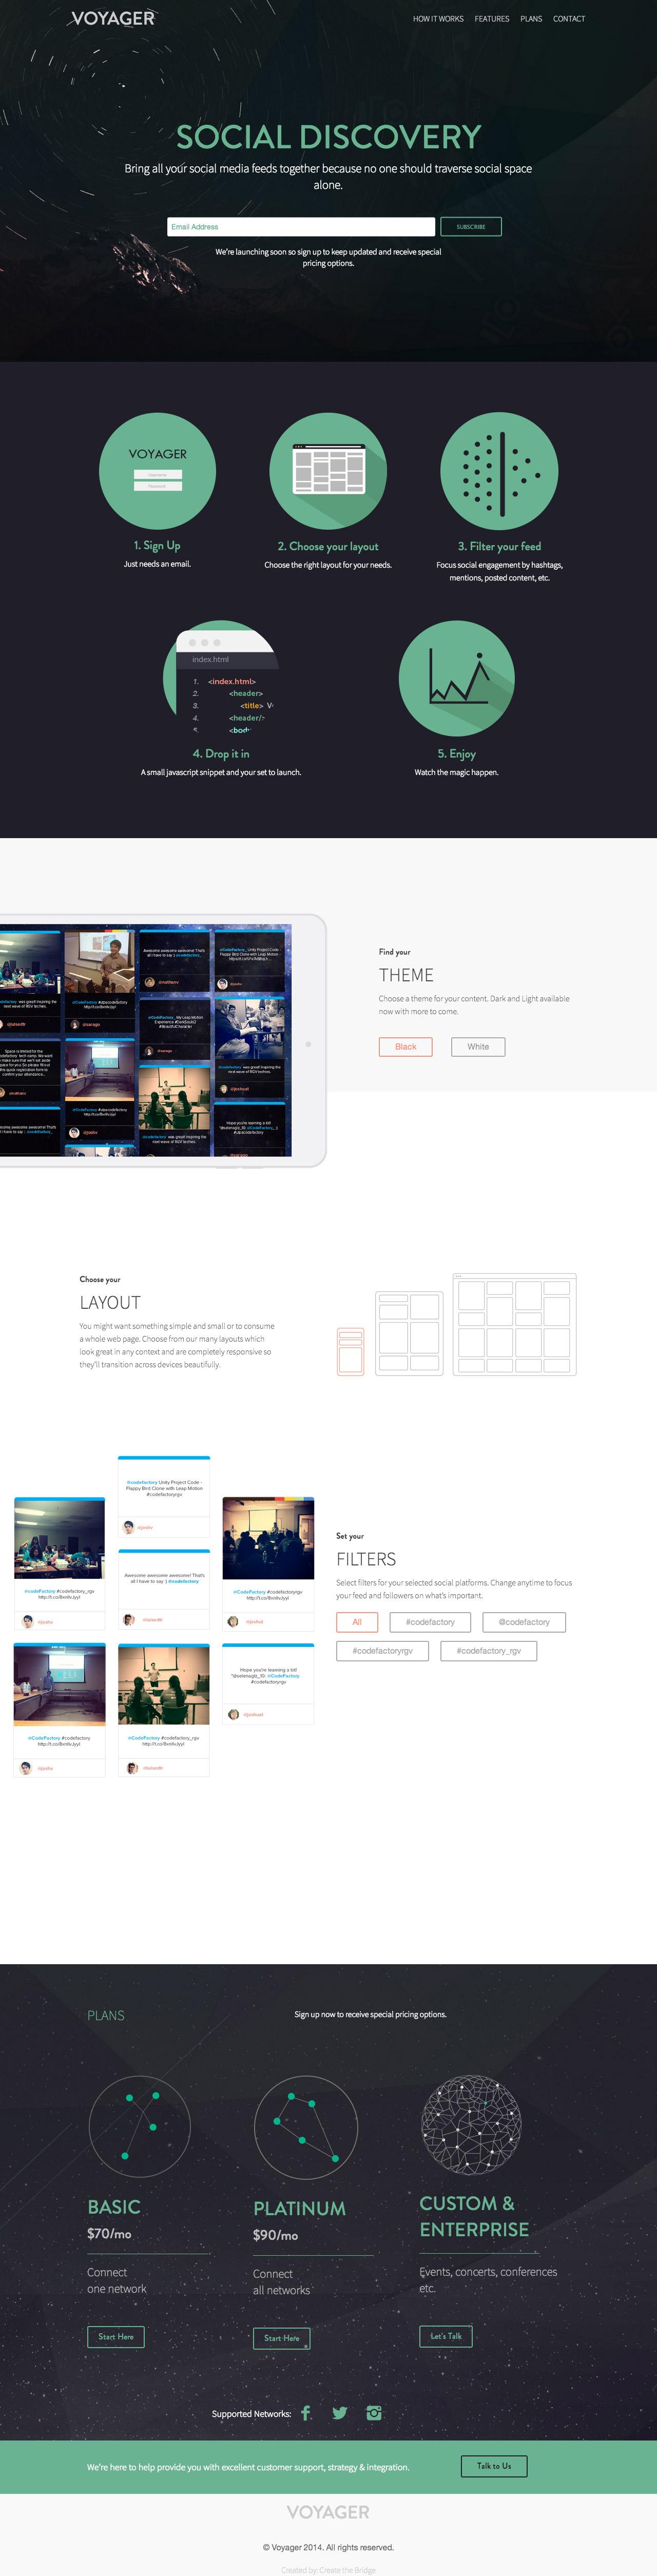 Voyager Website Screenshot